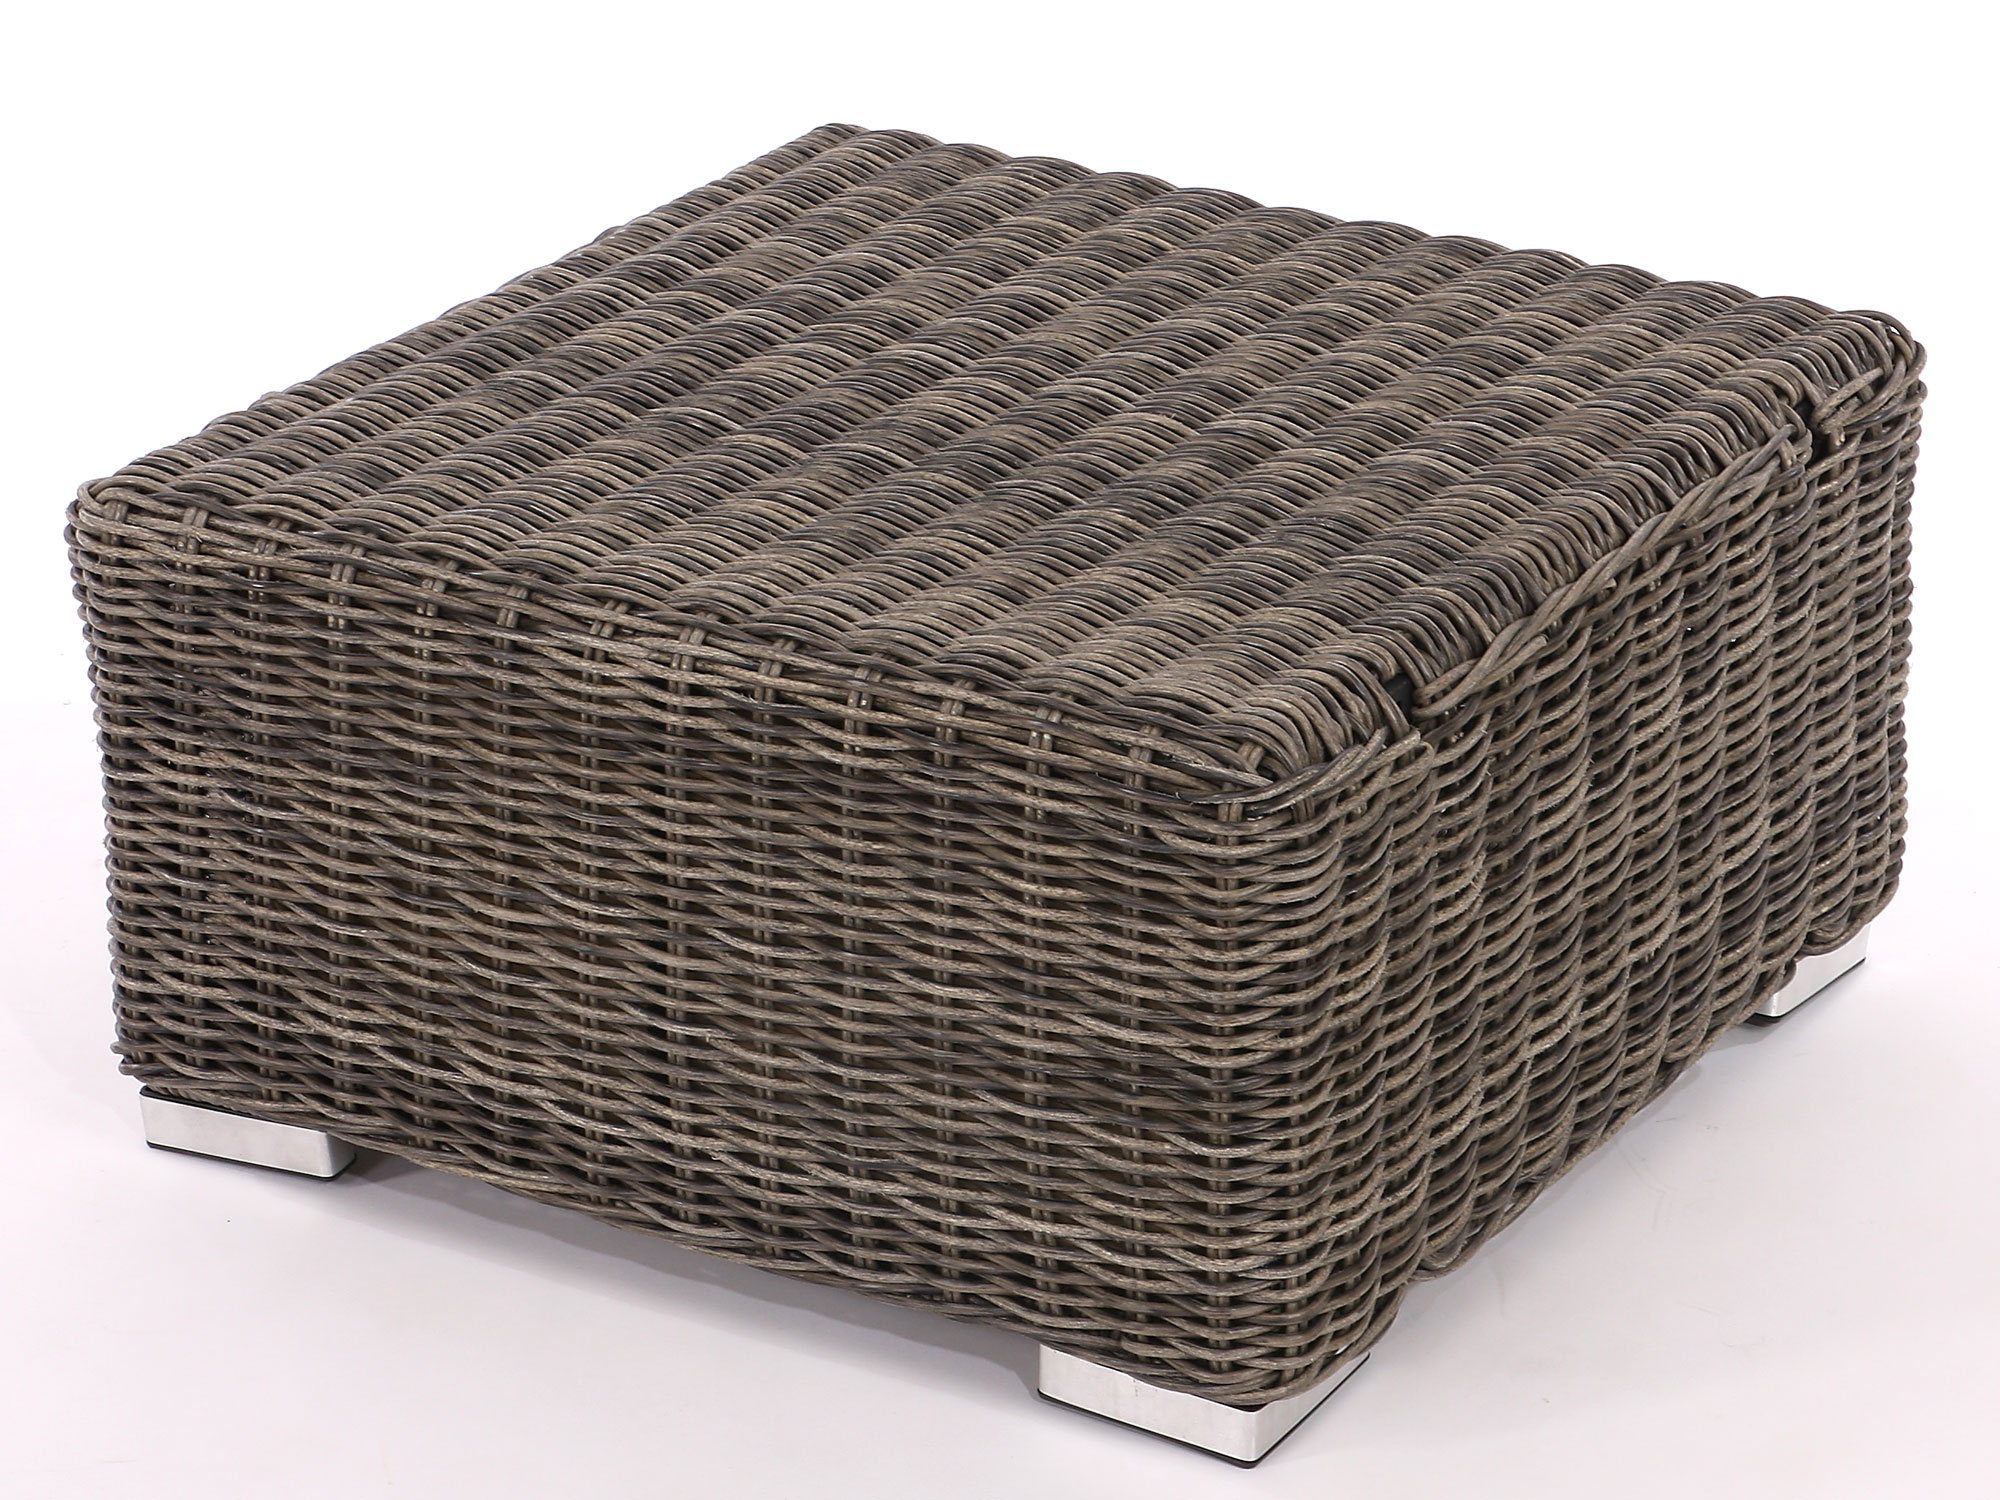 poly rattan sofa sevilla modulare gastronomie qualit t. Black Bedroom Furniture Sets. Home Design Ideas